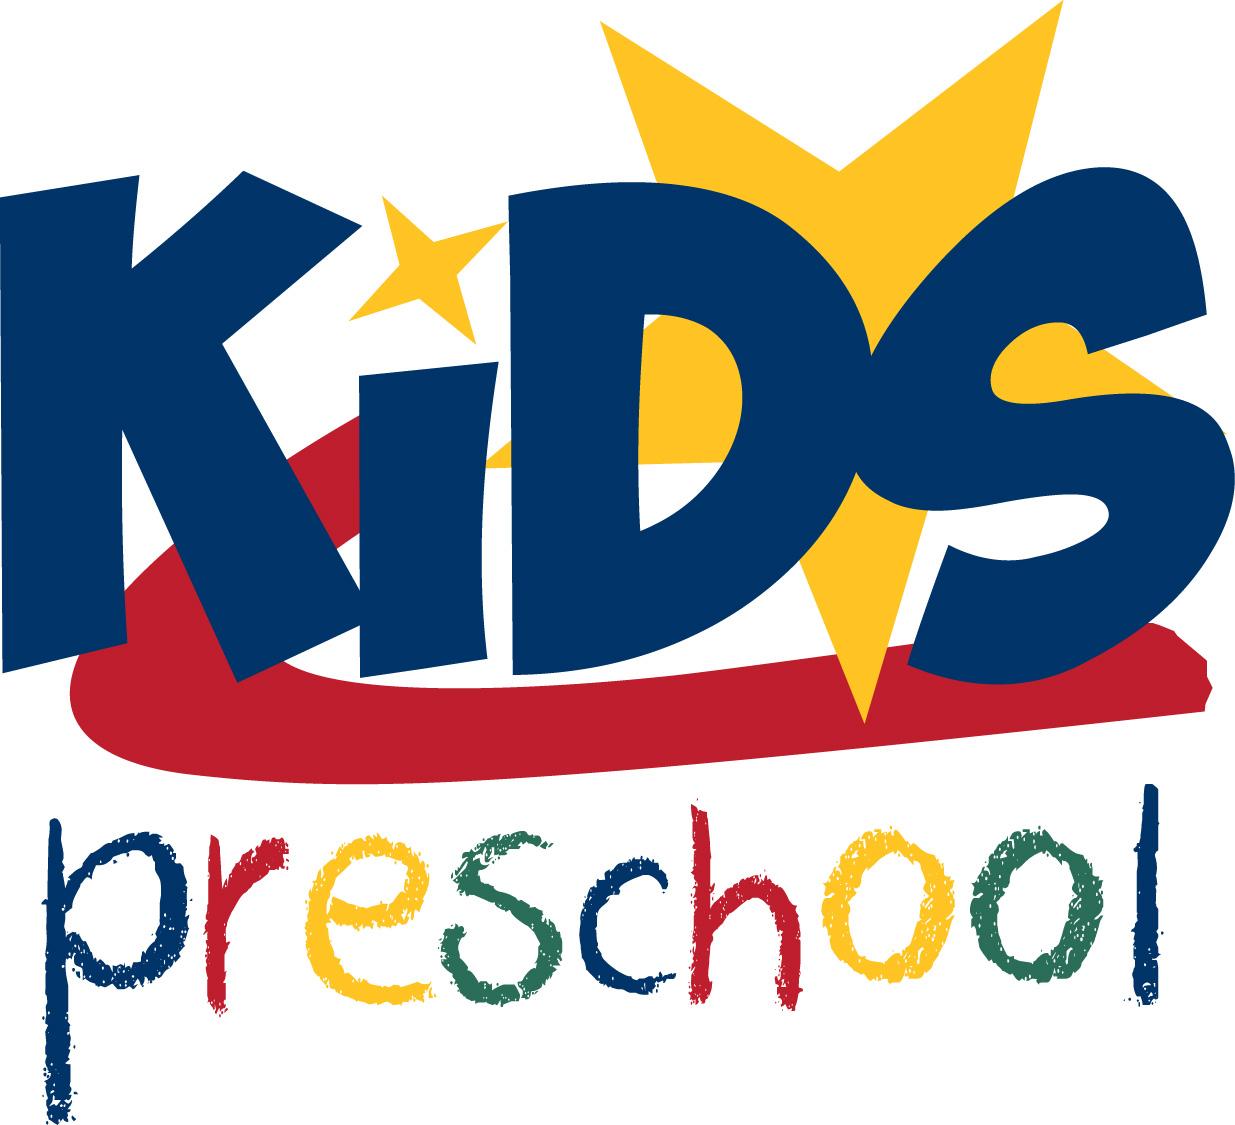 preschool logos rh logolynx com preschool logo designs preschool logos and designs